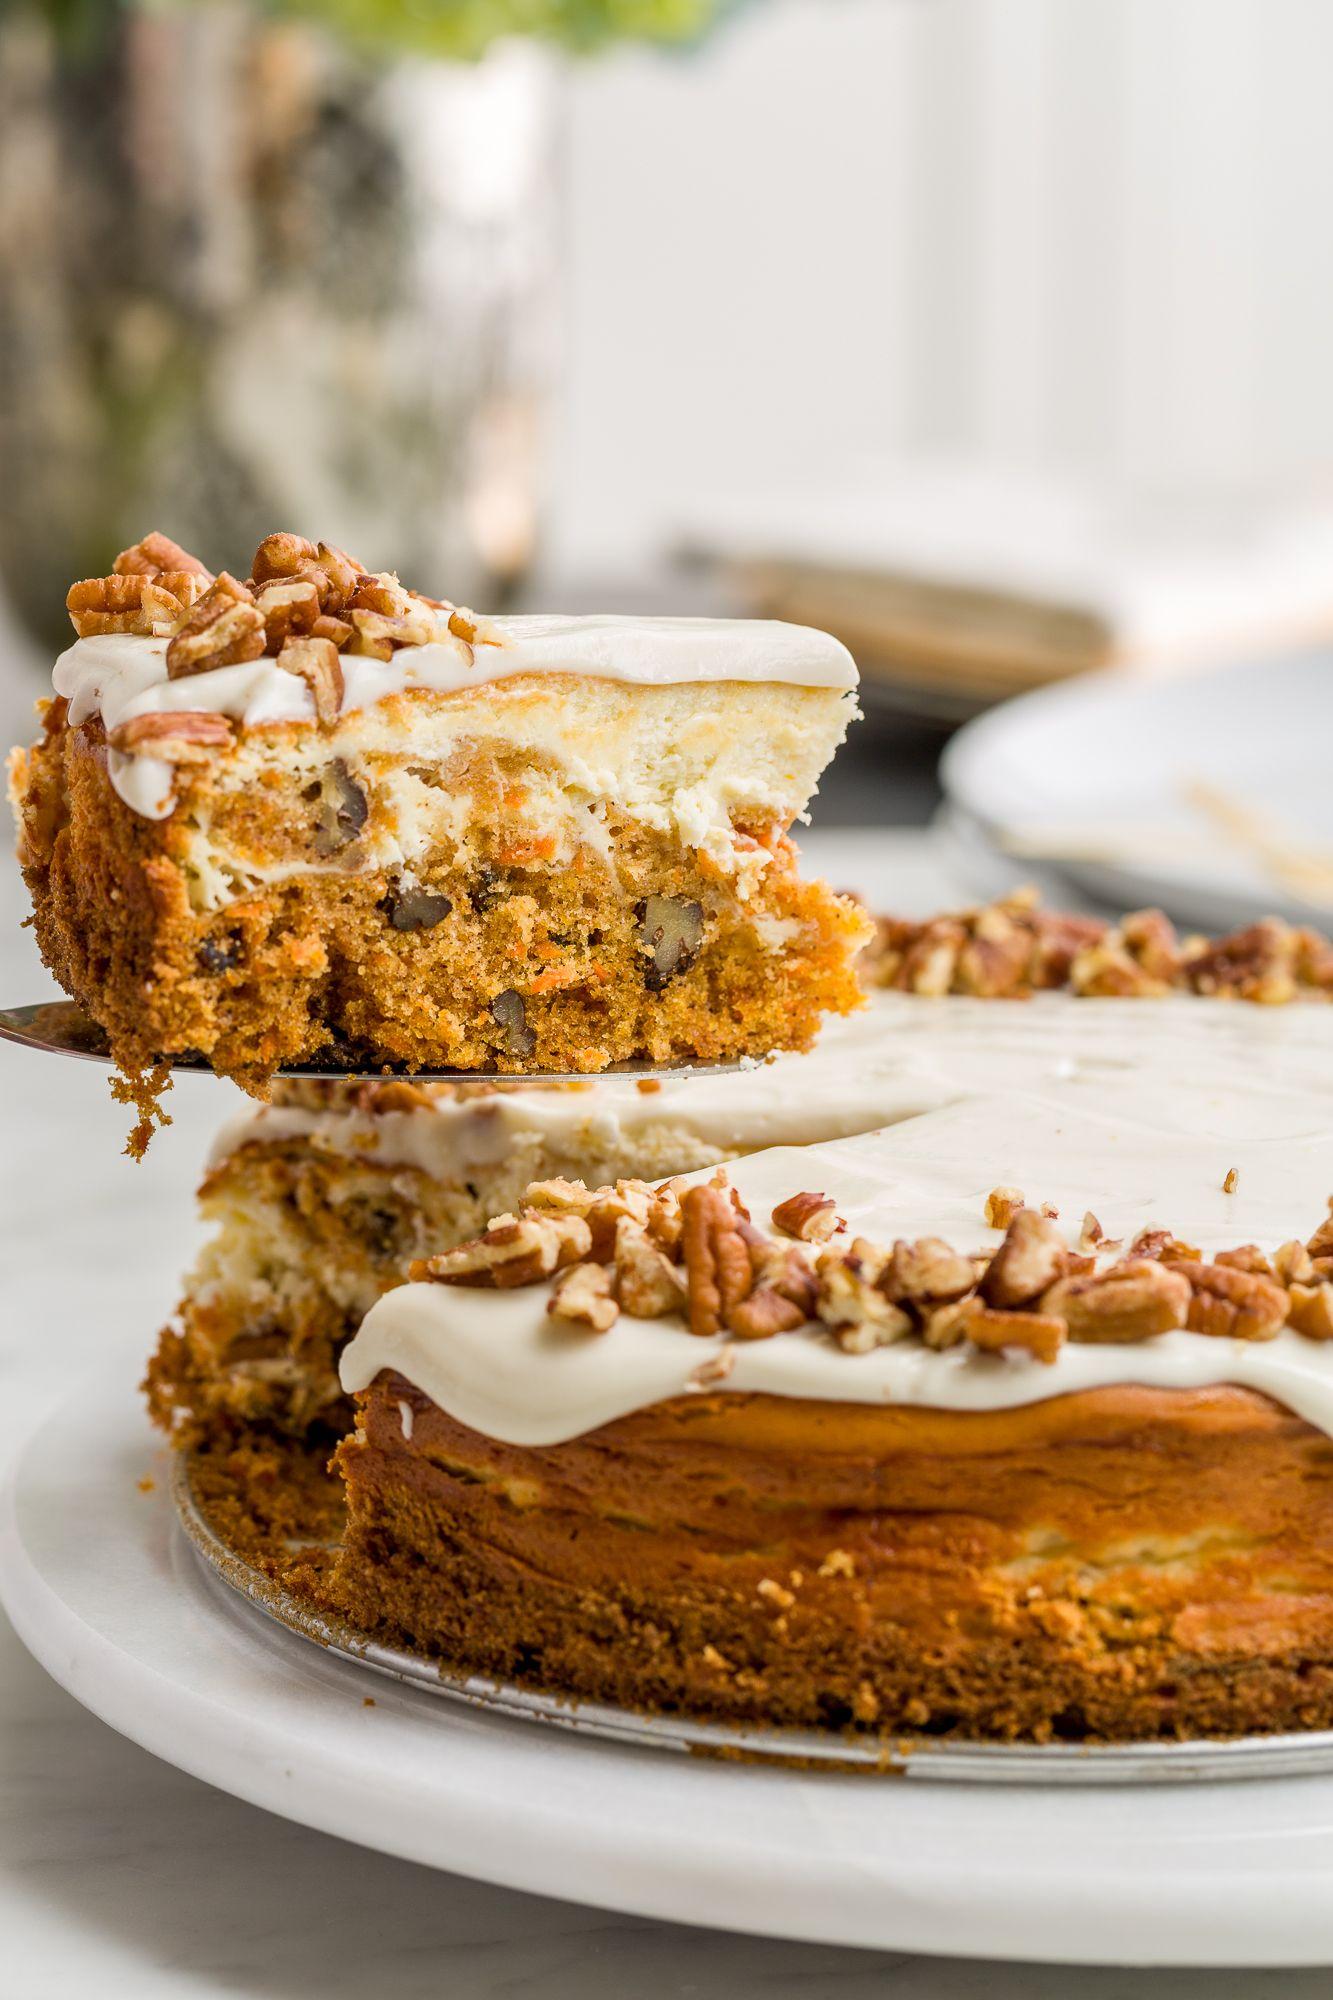 Best Carrot Cake Cheesecake Recipe How To Make Carrot Cake Cheesecake